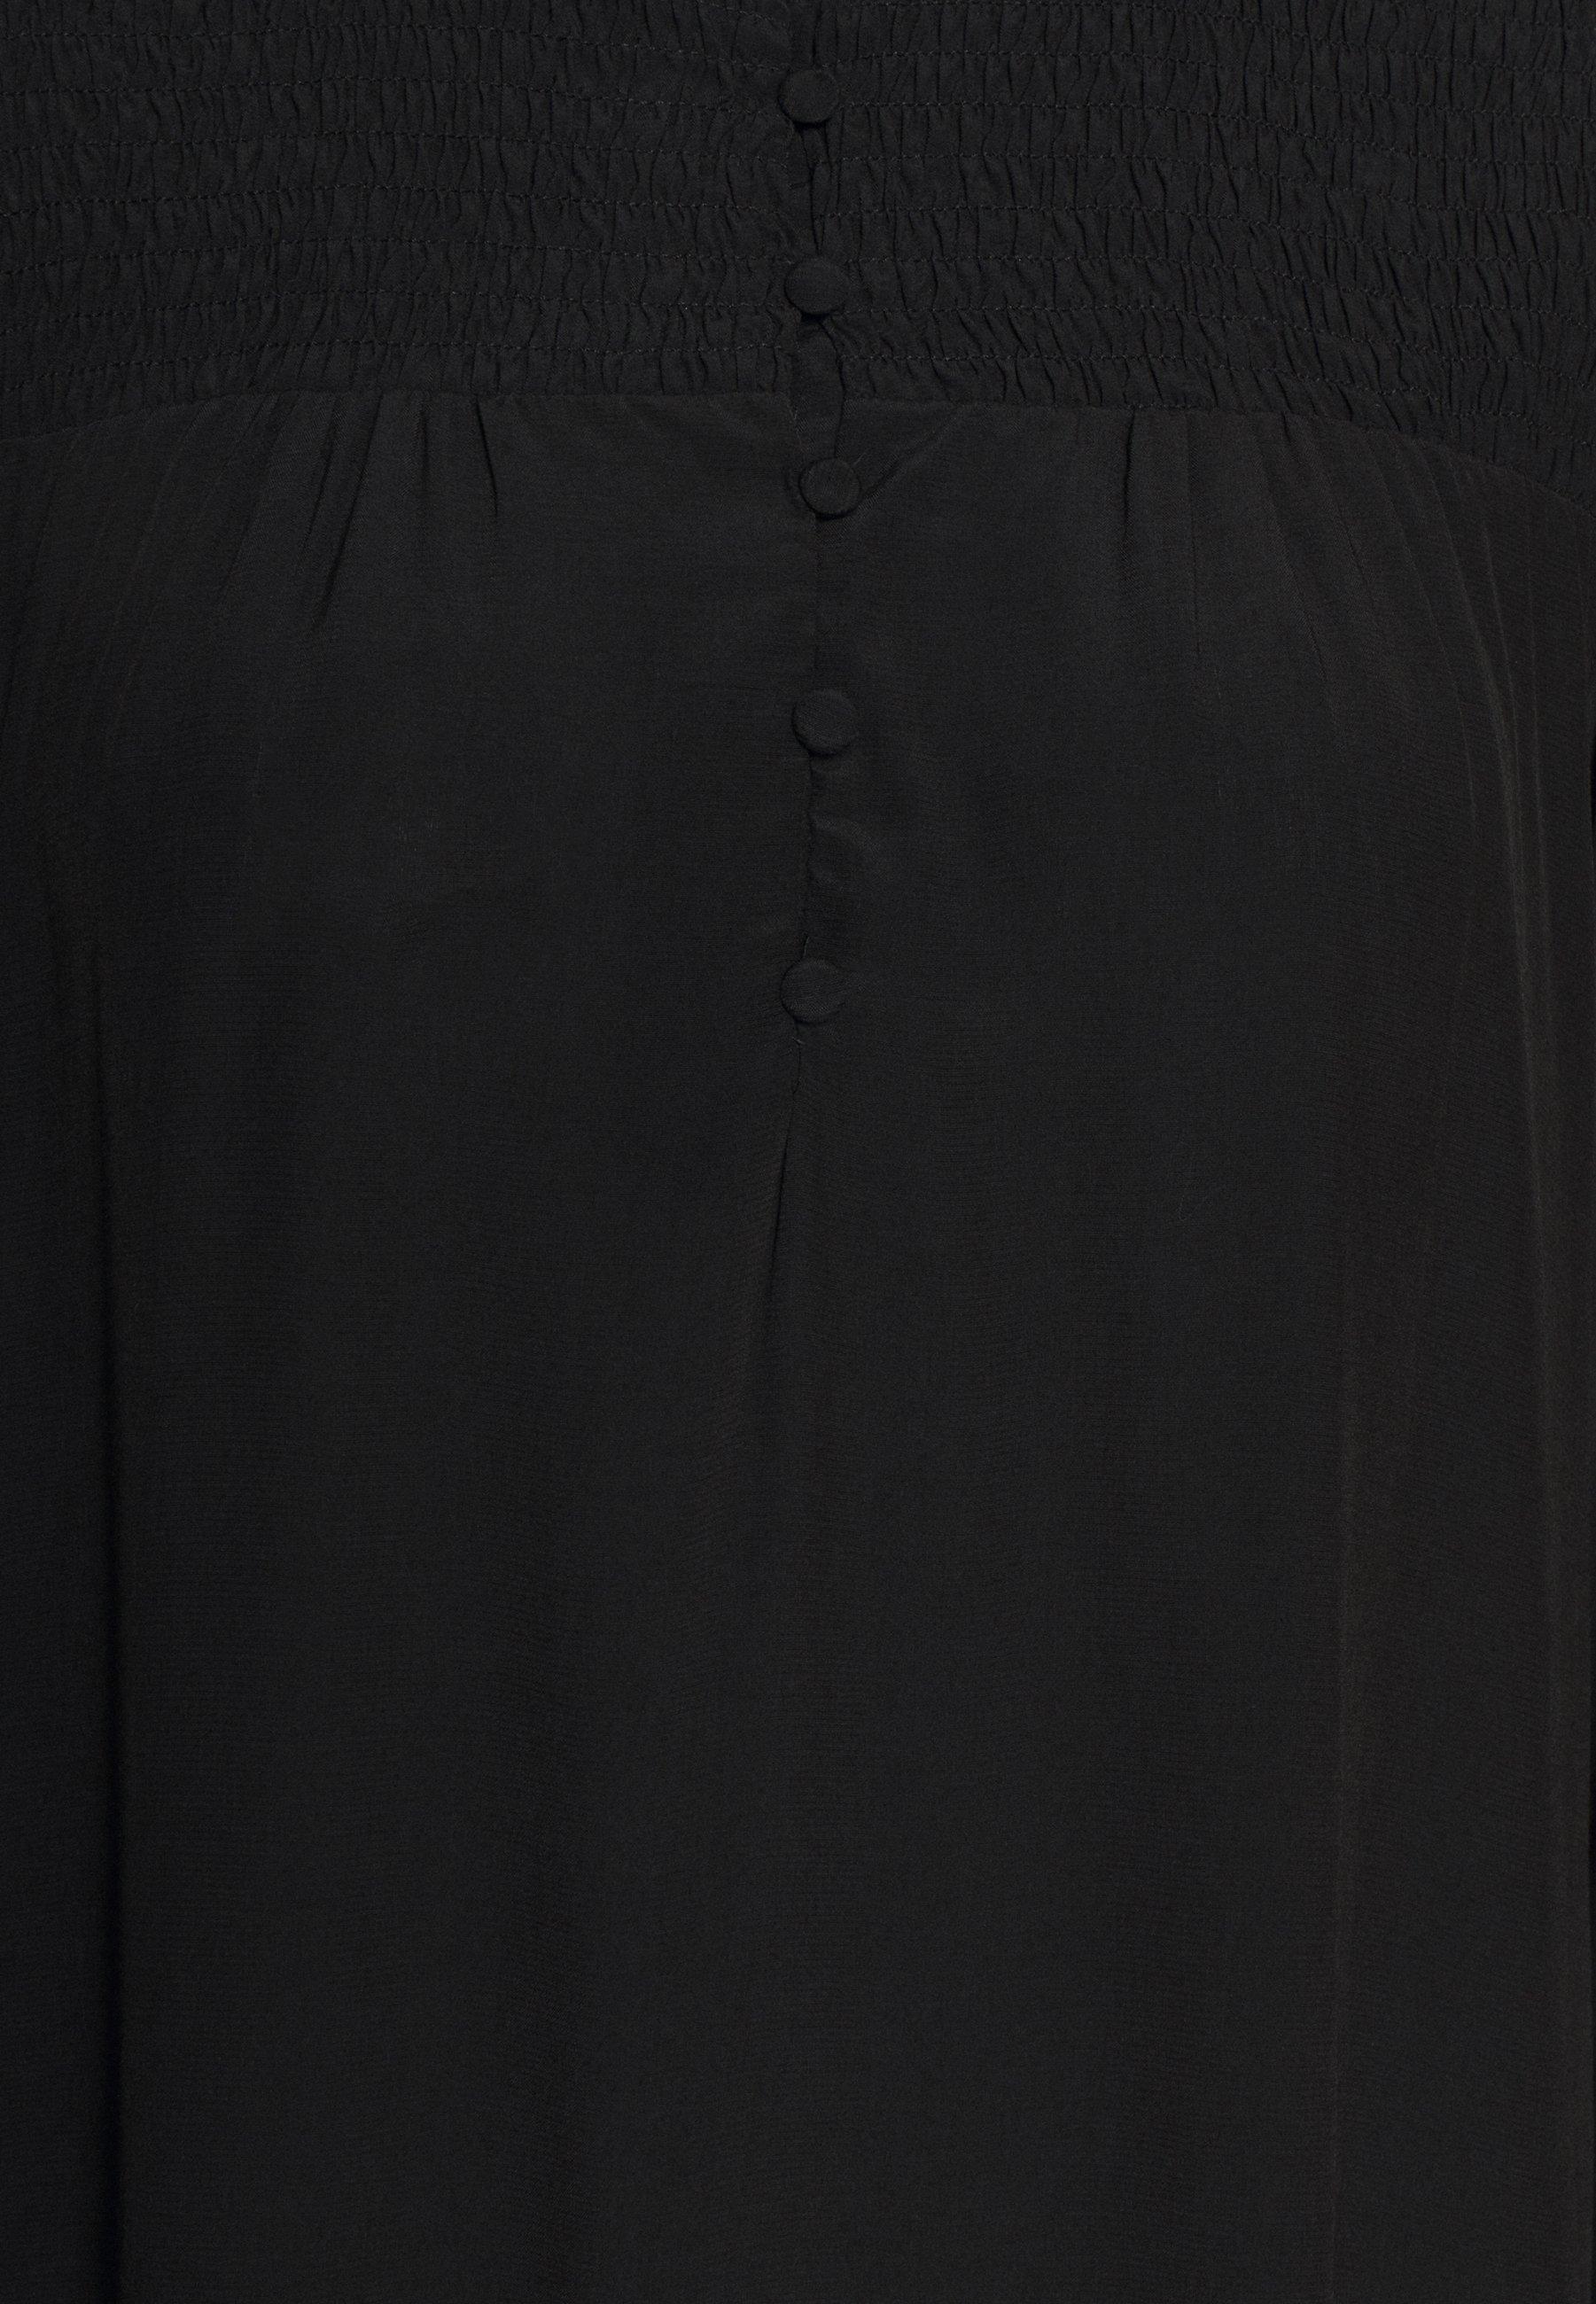 Pre Order Super Women's Clothing Cream SIGNECR MINI DRESS Shirt dress pitch black Pnr2iO61A U5fZD3ggY